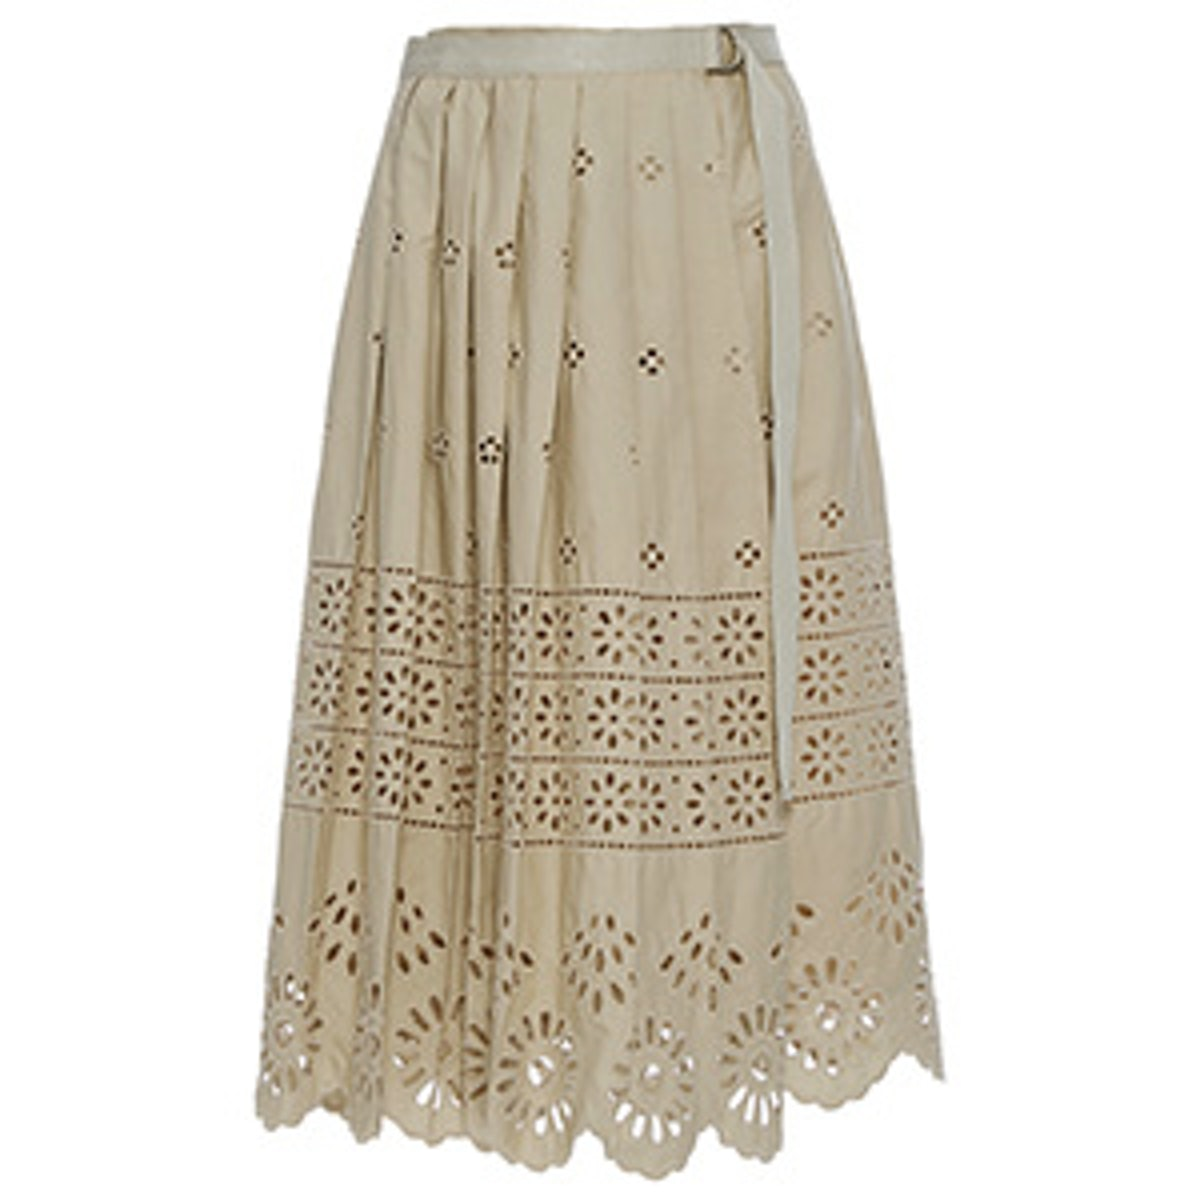 Wrap Eyelet Skirt